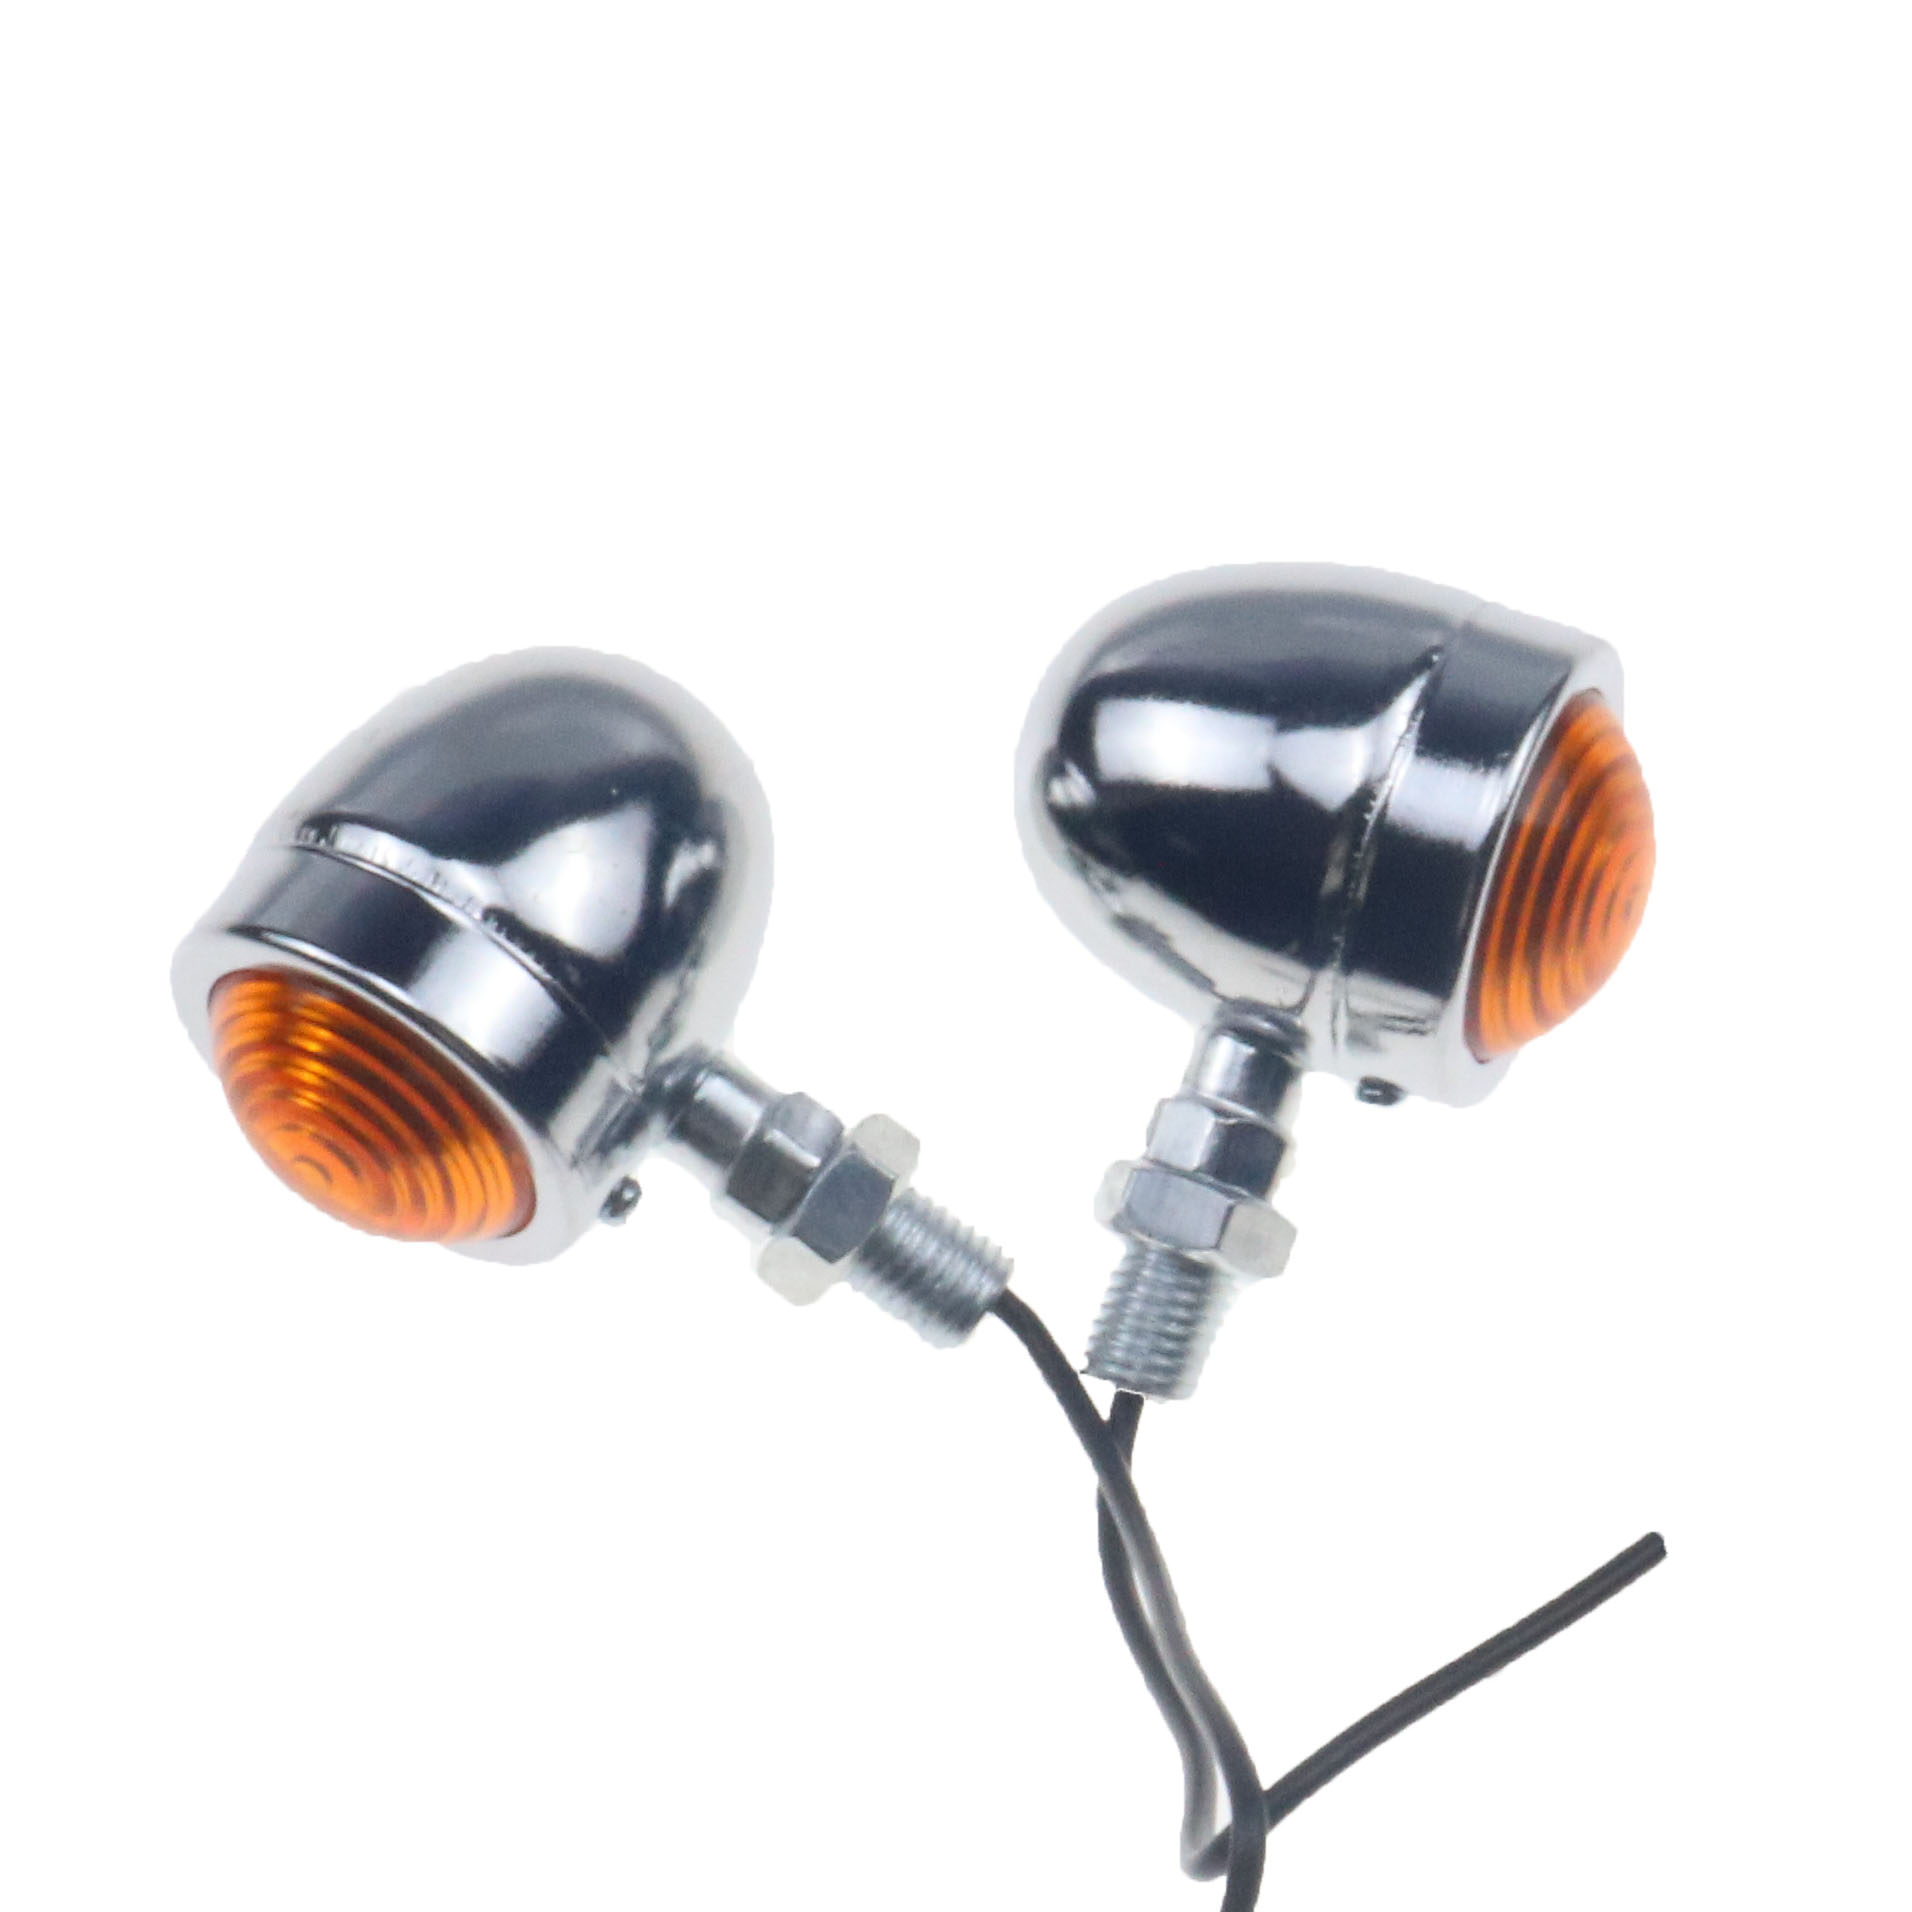 2-pieces-motorcycle-motorbike-mini-bullet-turn-signals-lamp-mark-lihgt-indicator-light-cruiser-chopper-cafe-racer-rat-custom-cb